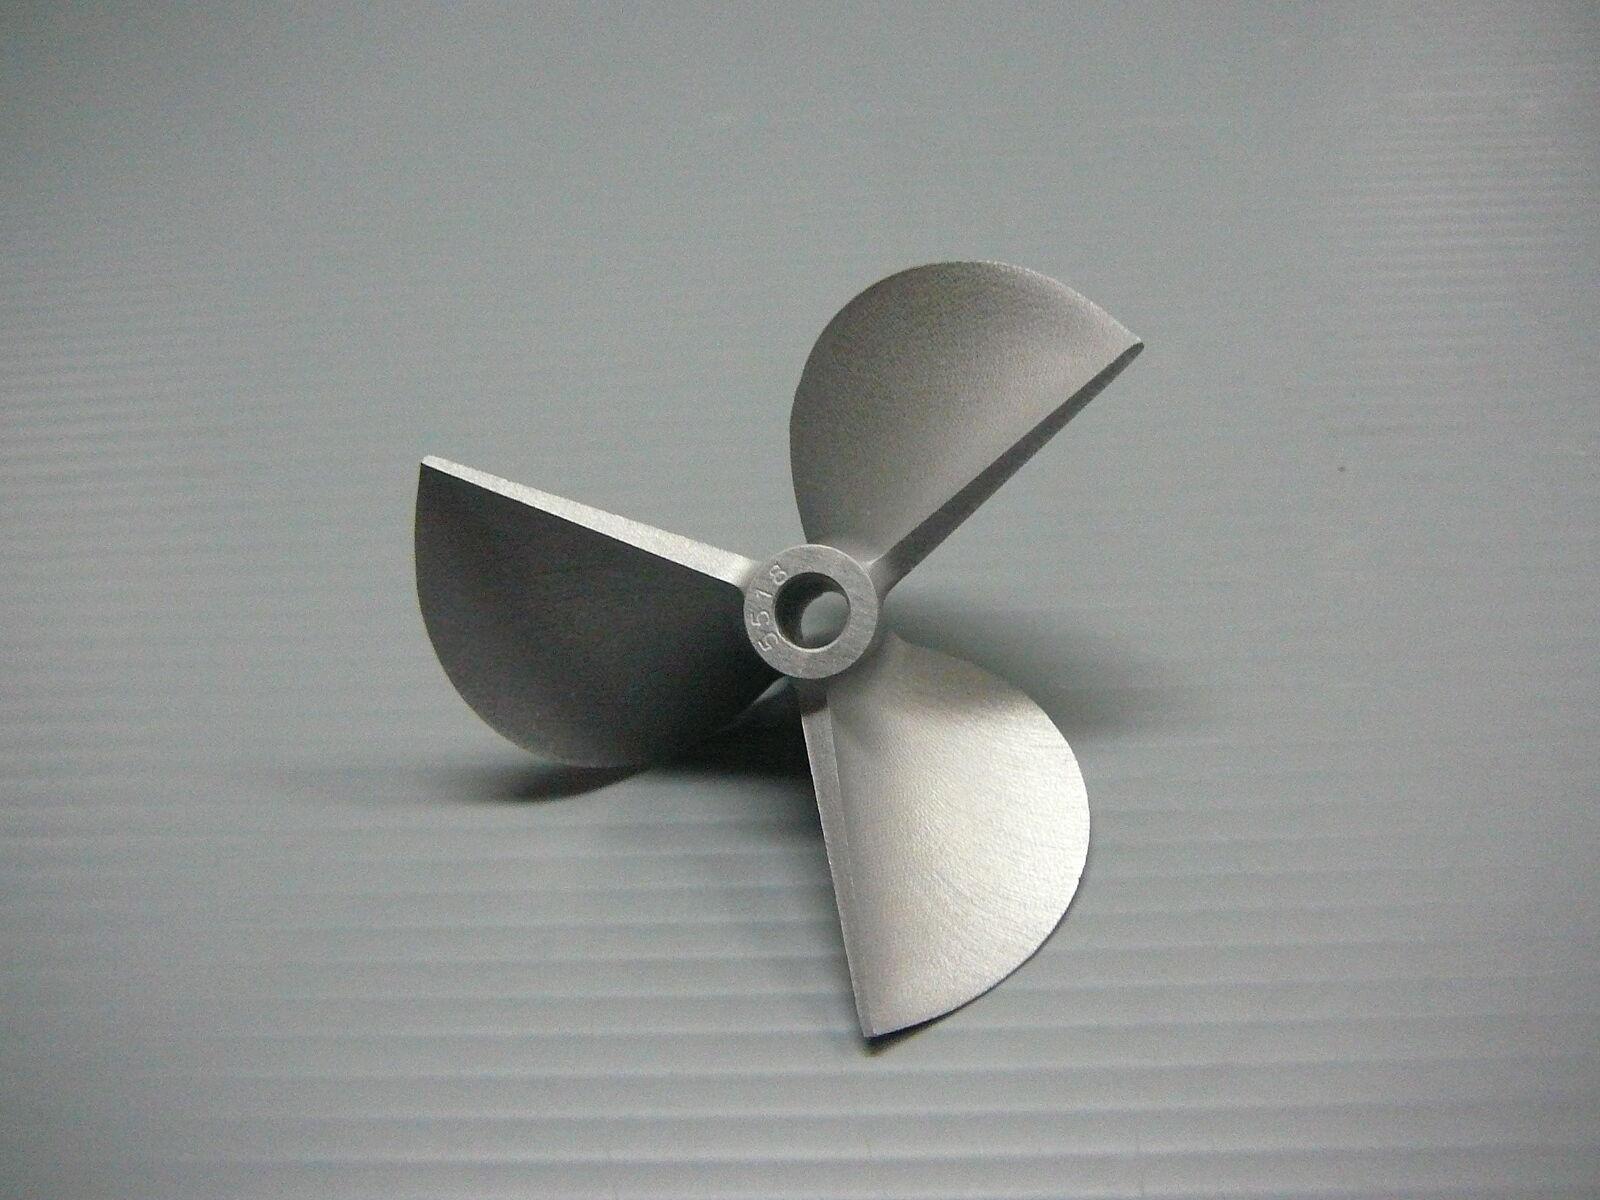 VXP serie 1 4  Eje 69mm diámetro M 1.8p 3 Blade CNC Aleación Prop Vee casco Hélice